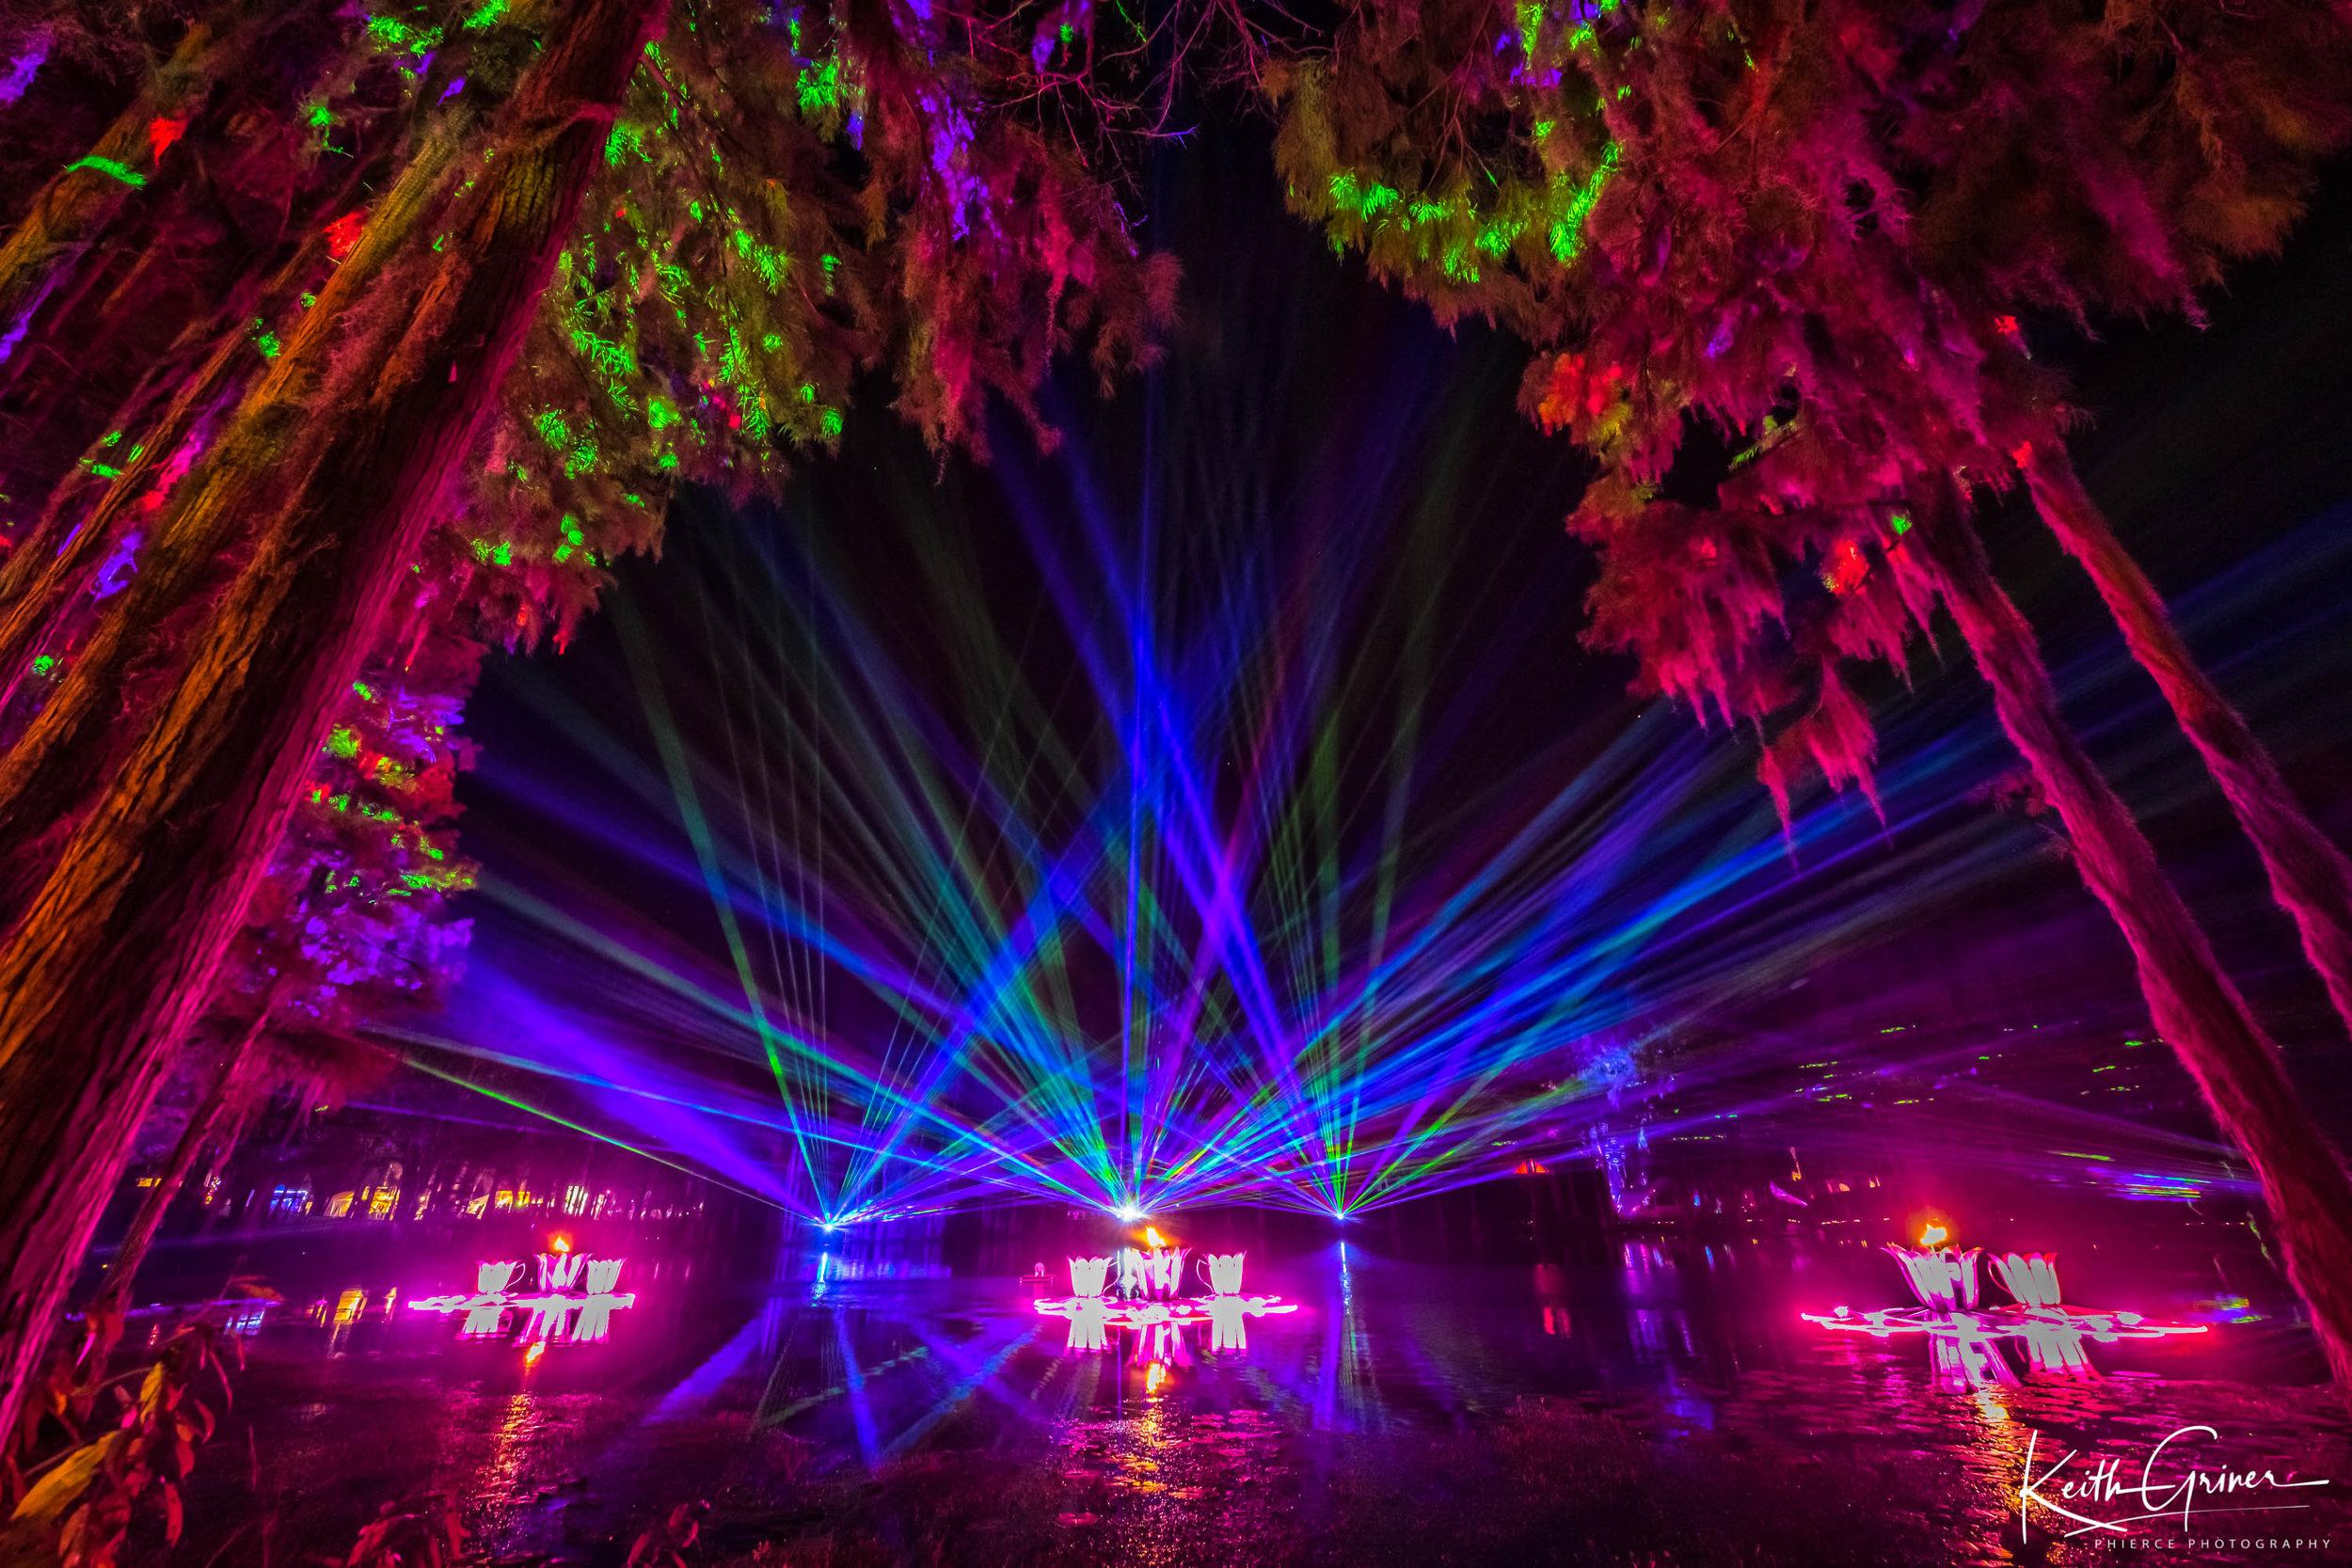 Hula_Spirit Lake_by Keith Griner 0D5_3185-Edit.jpg